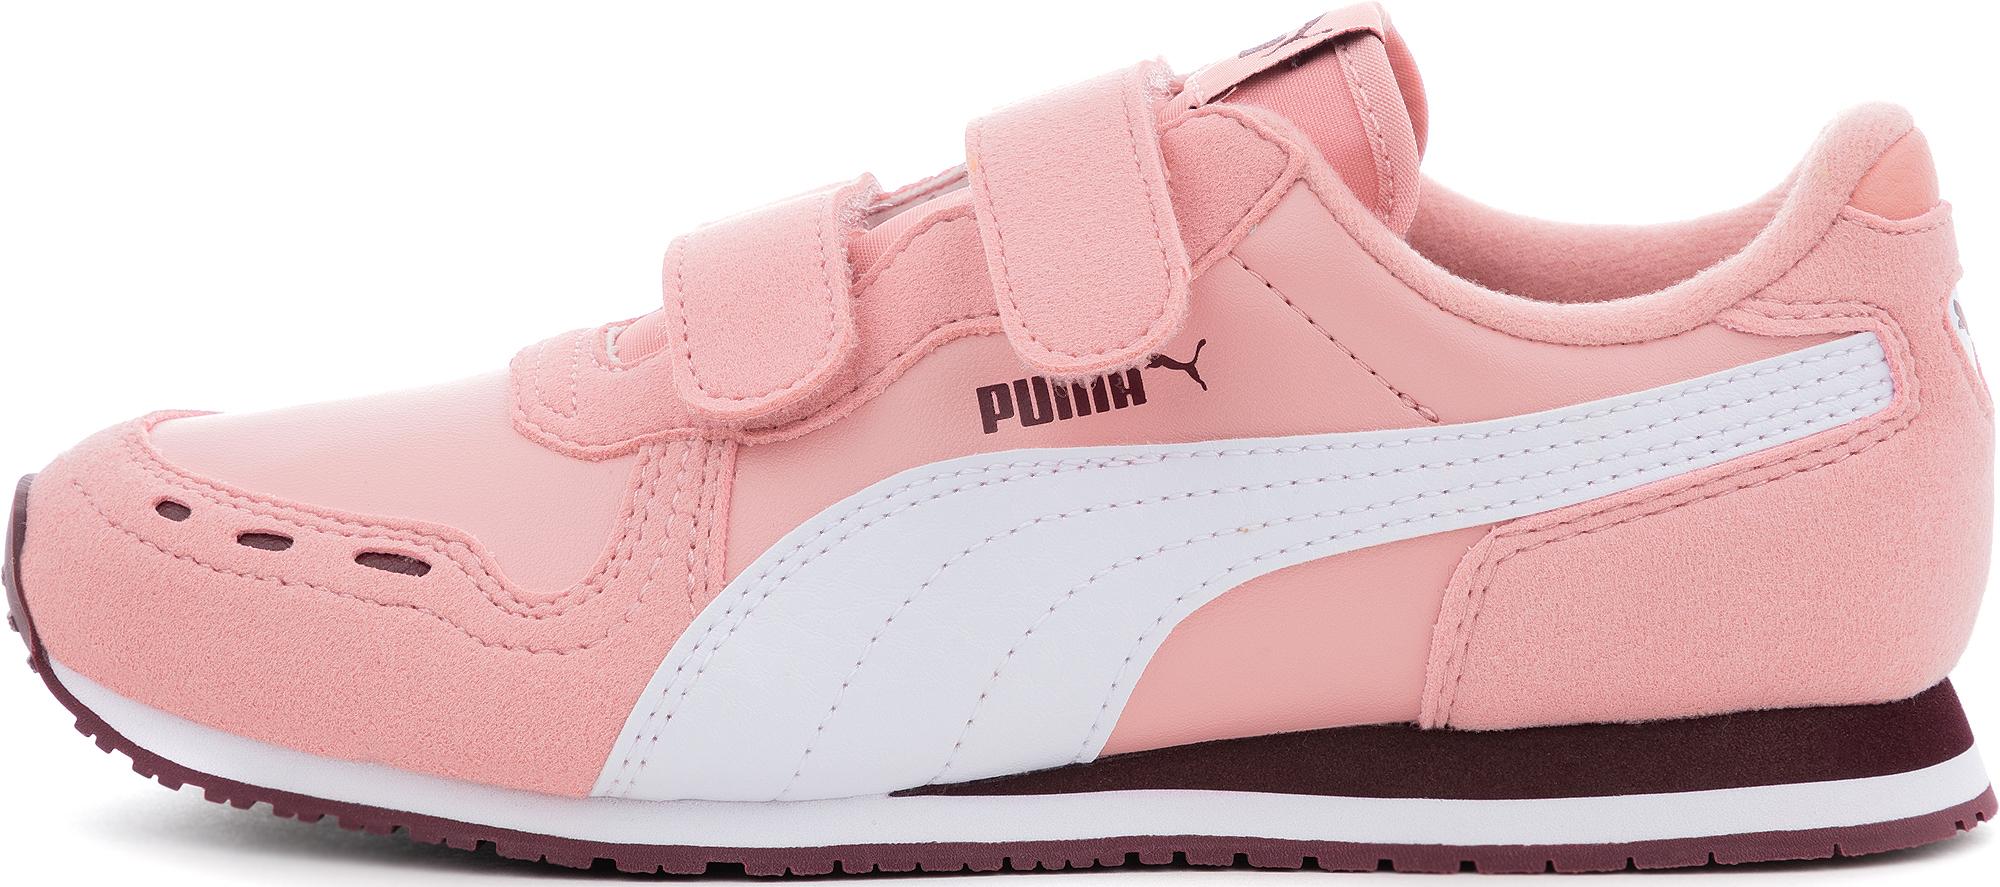 Puma Кроссовки для девочек Cabana Racer Sl V Ps, размер 34